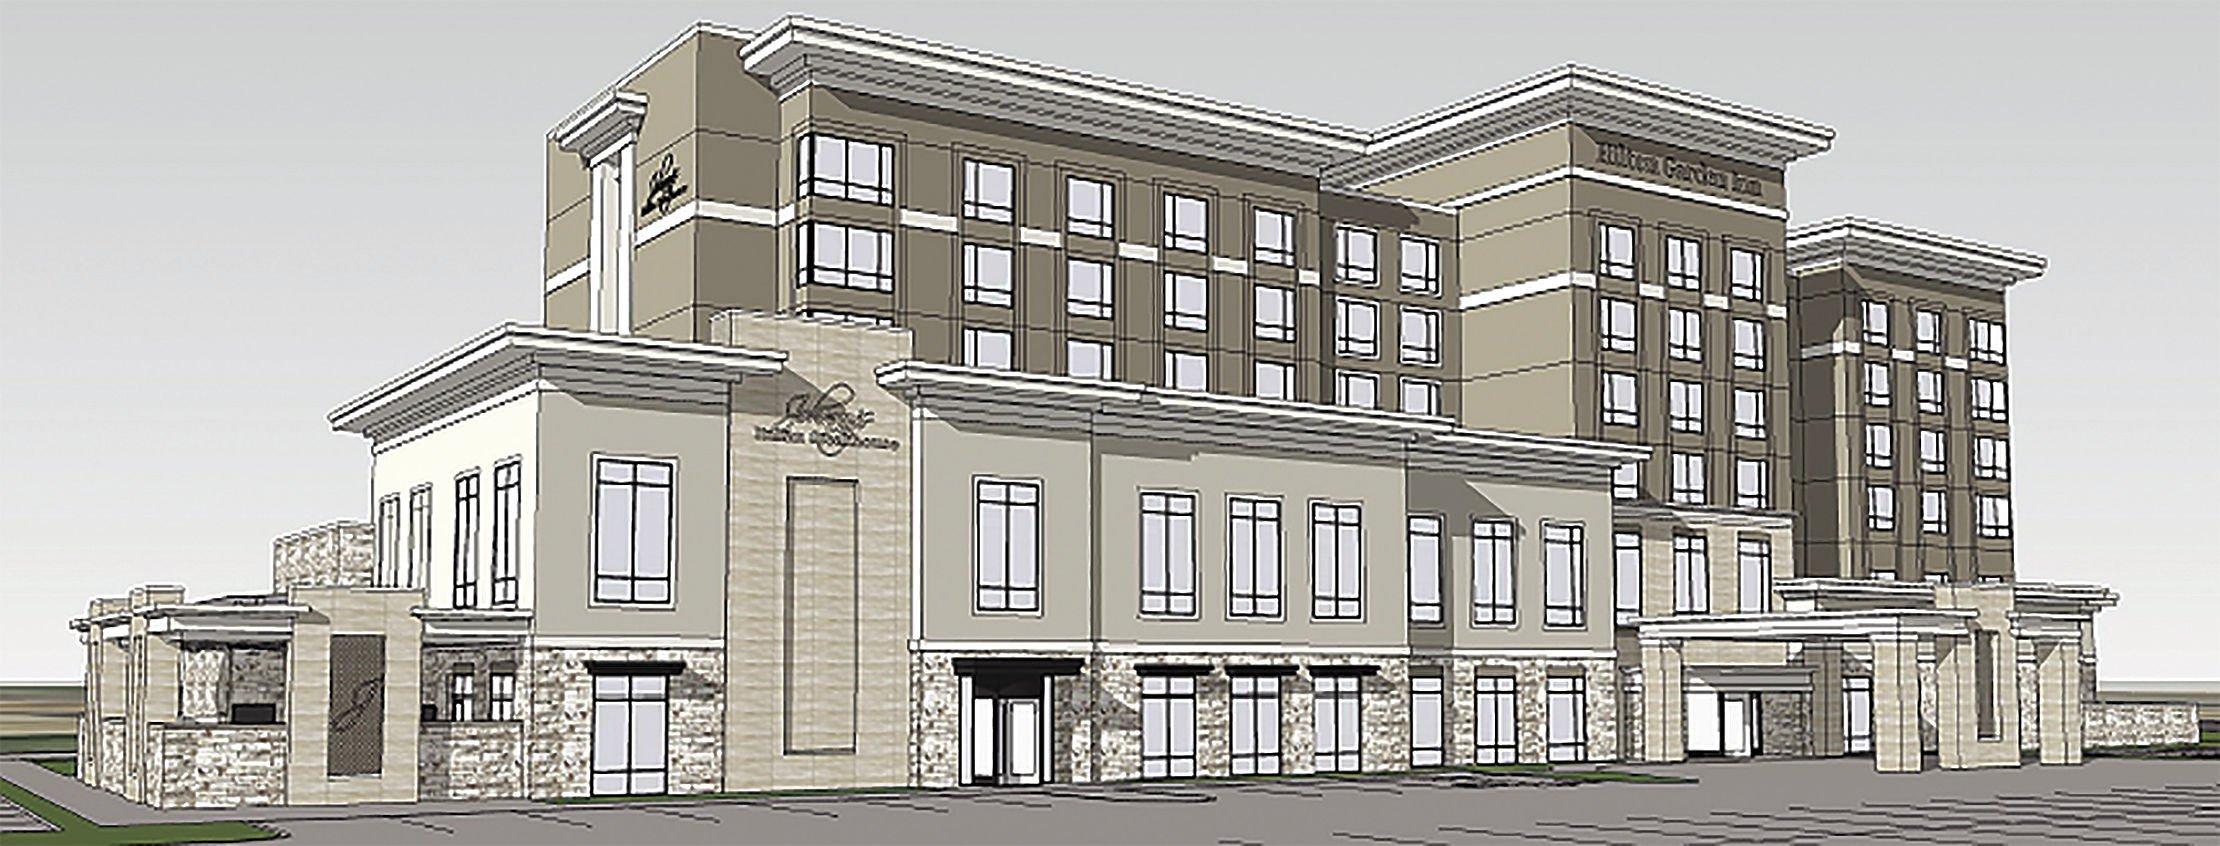 Hilton Garden Inn Given Final Approval